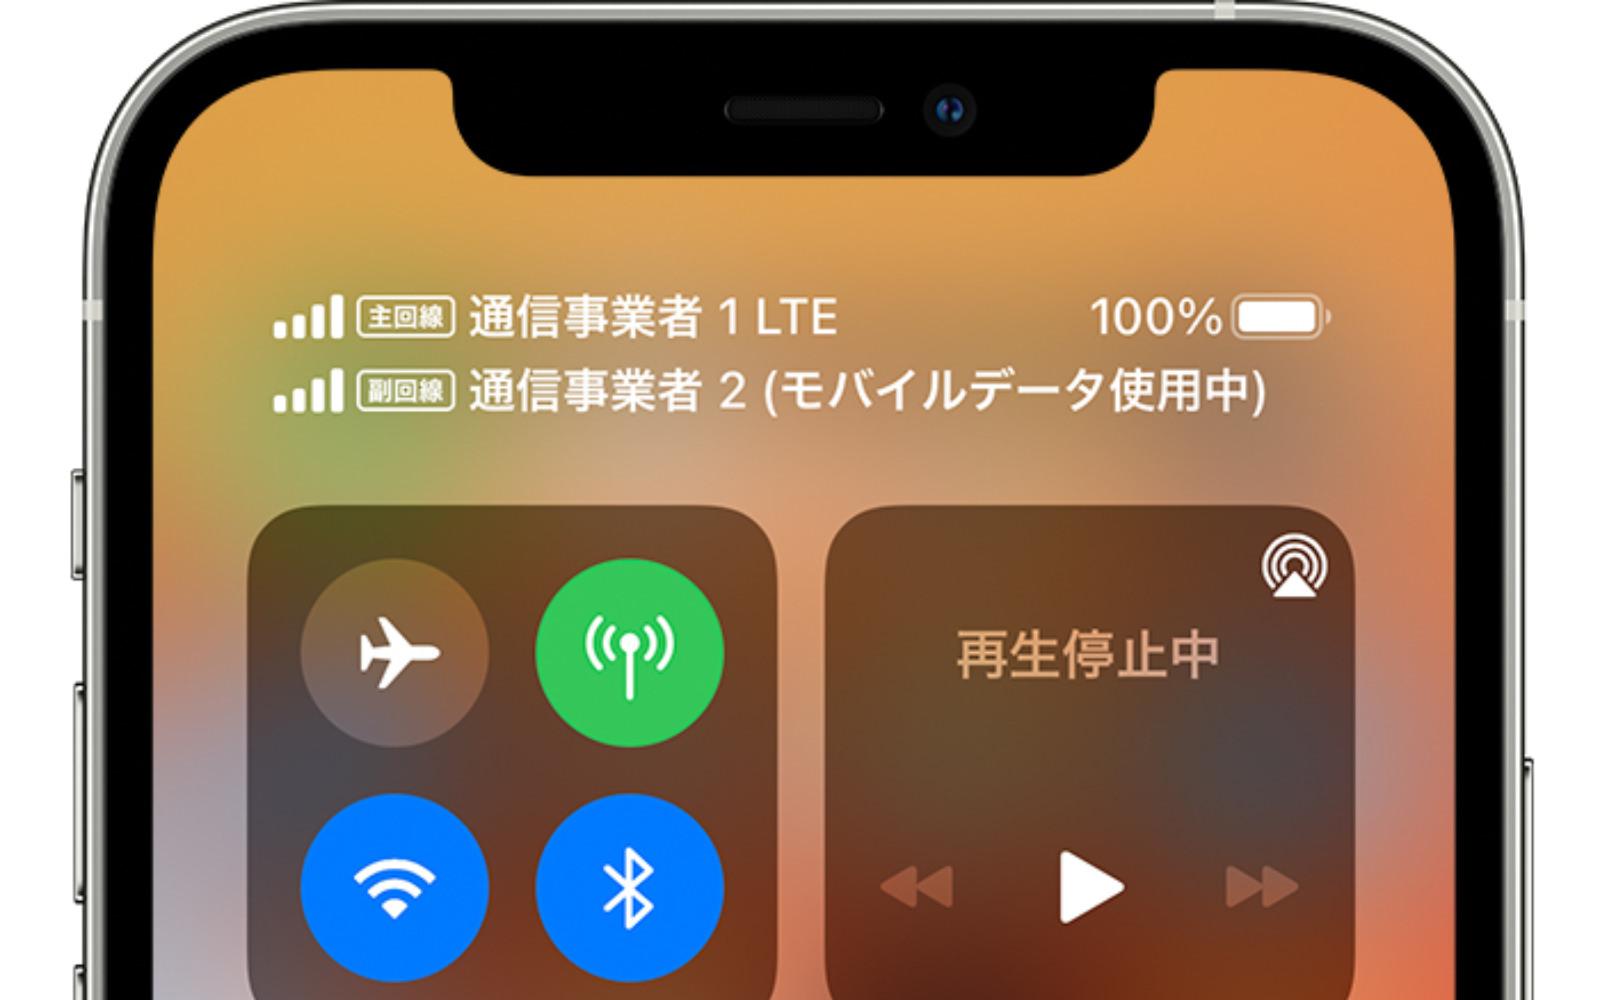 Dual SIM on iPhone